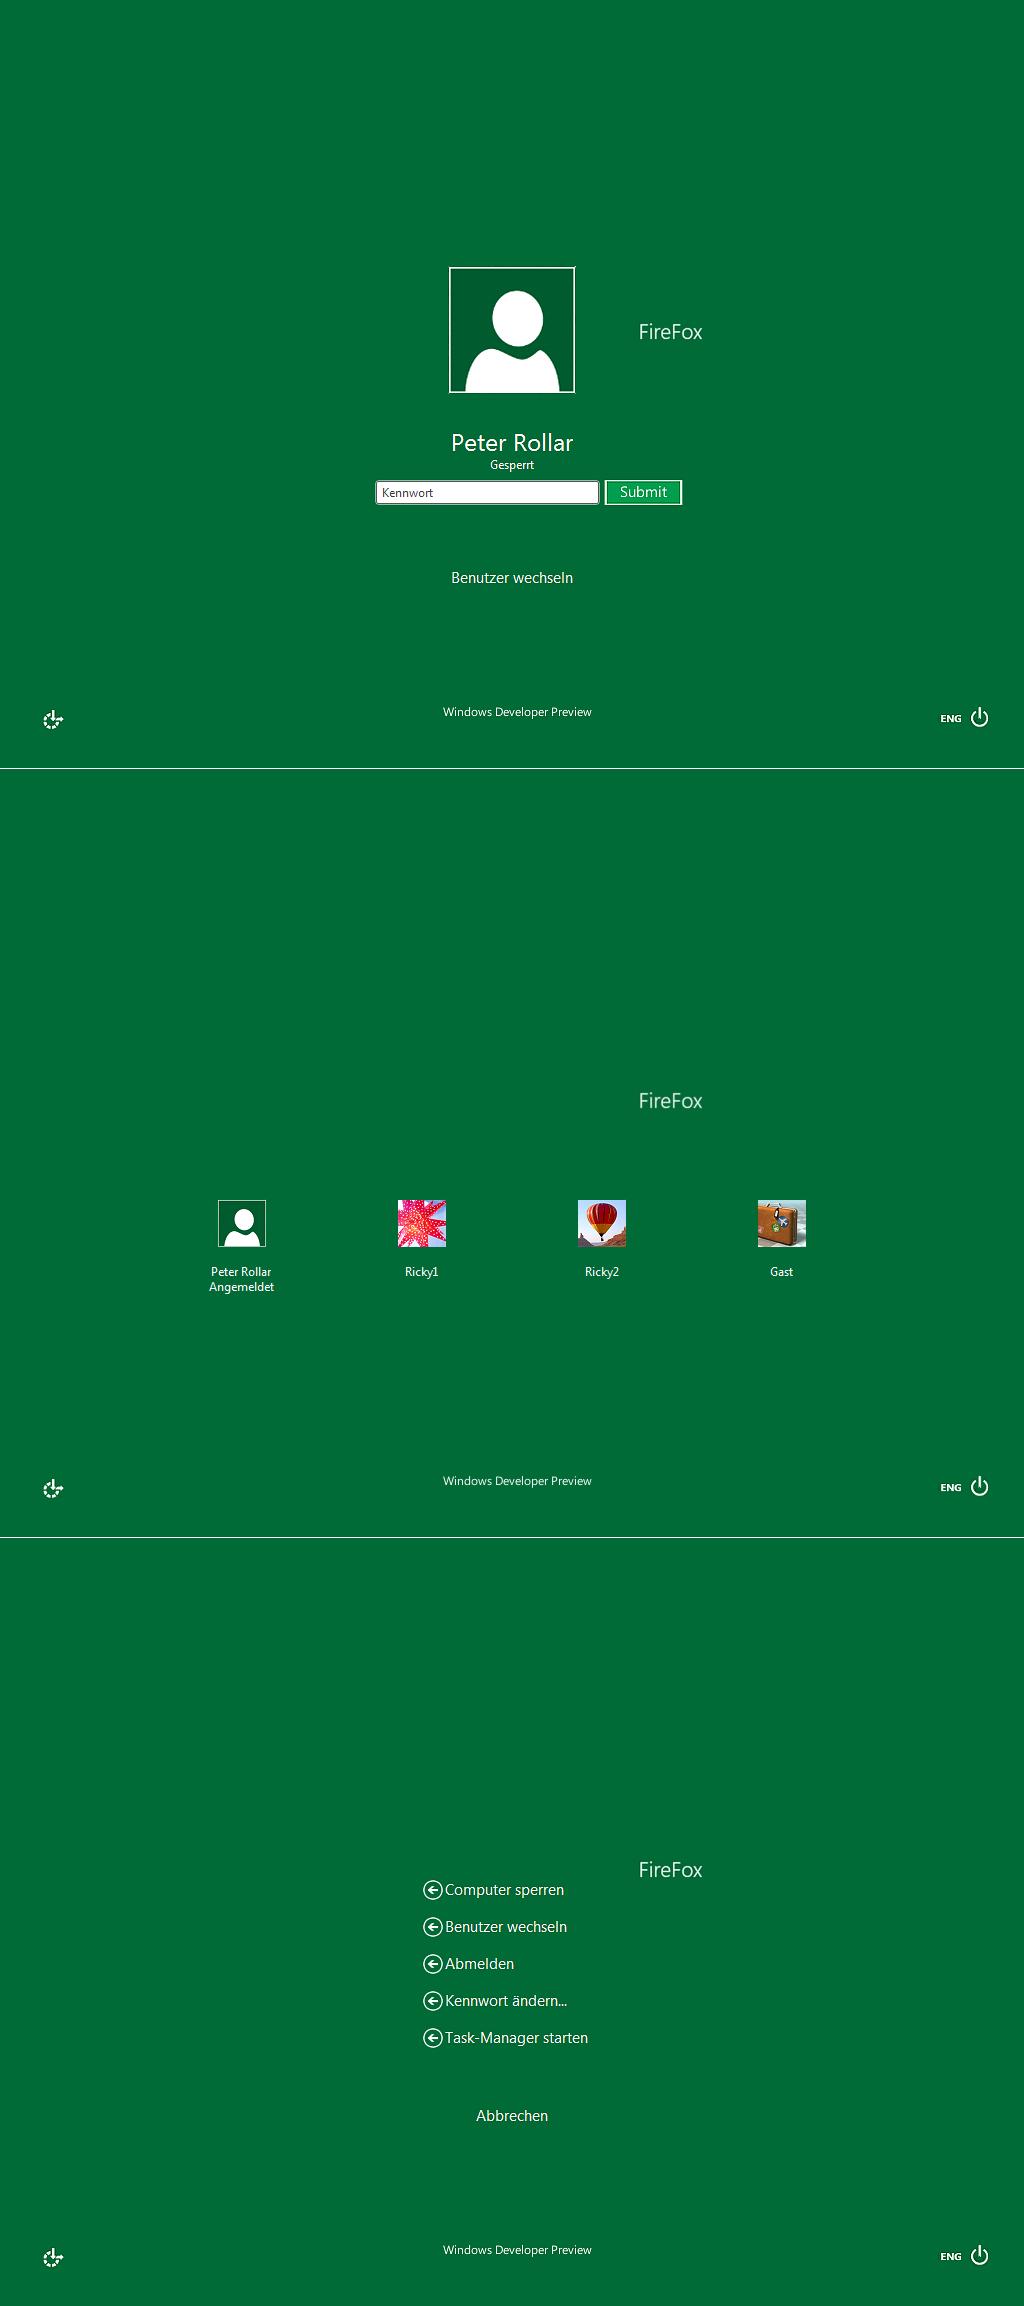 Windows8 logon for 7